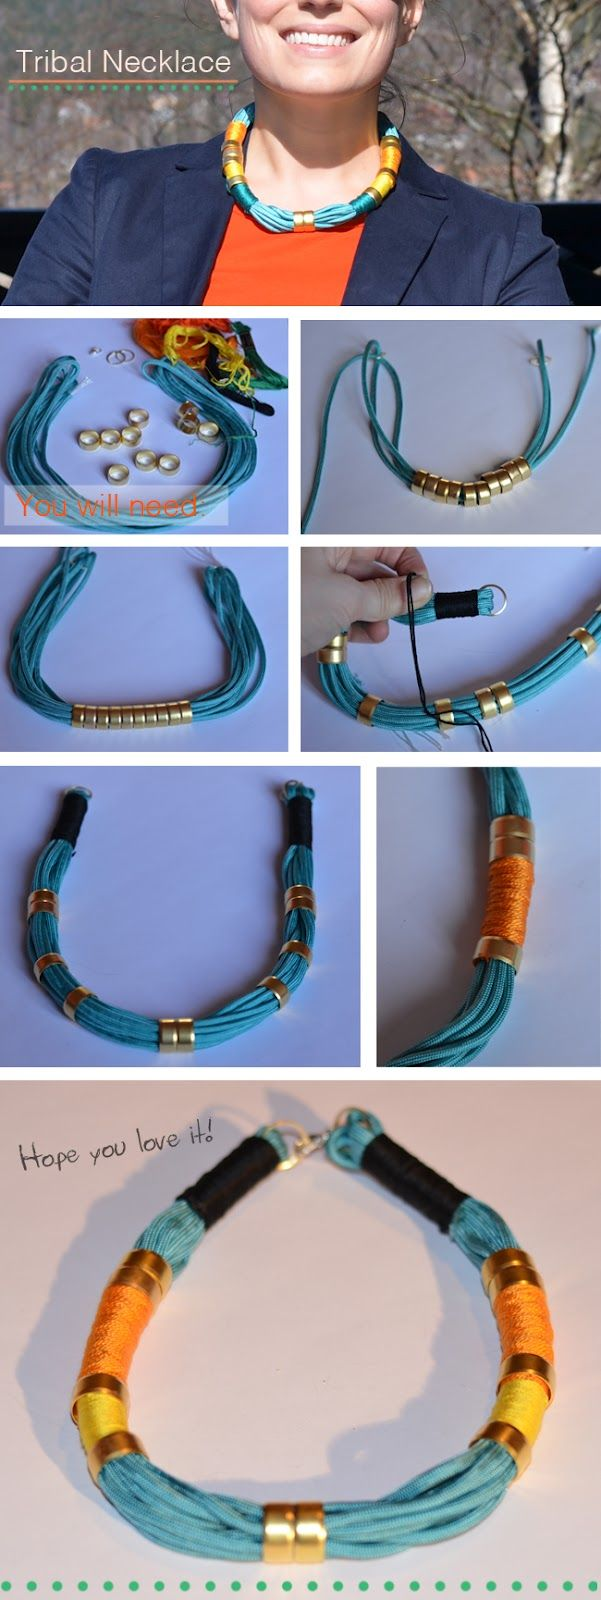 make it & fake it: Tribal Necklace DIY